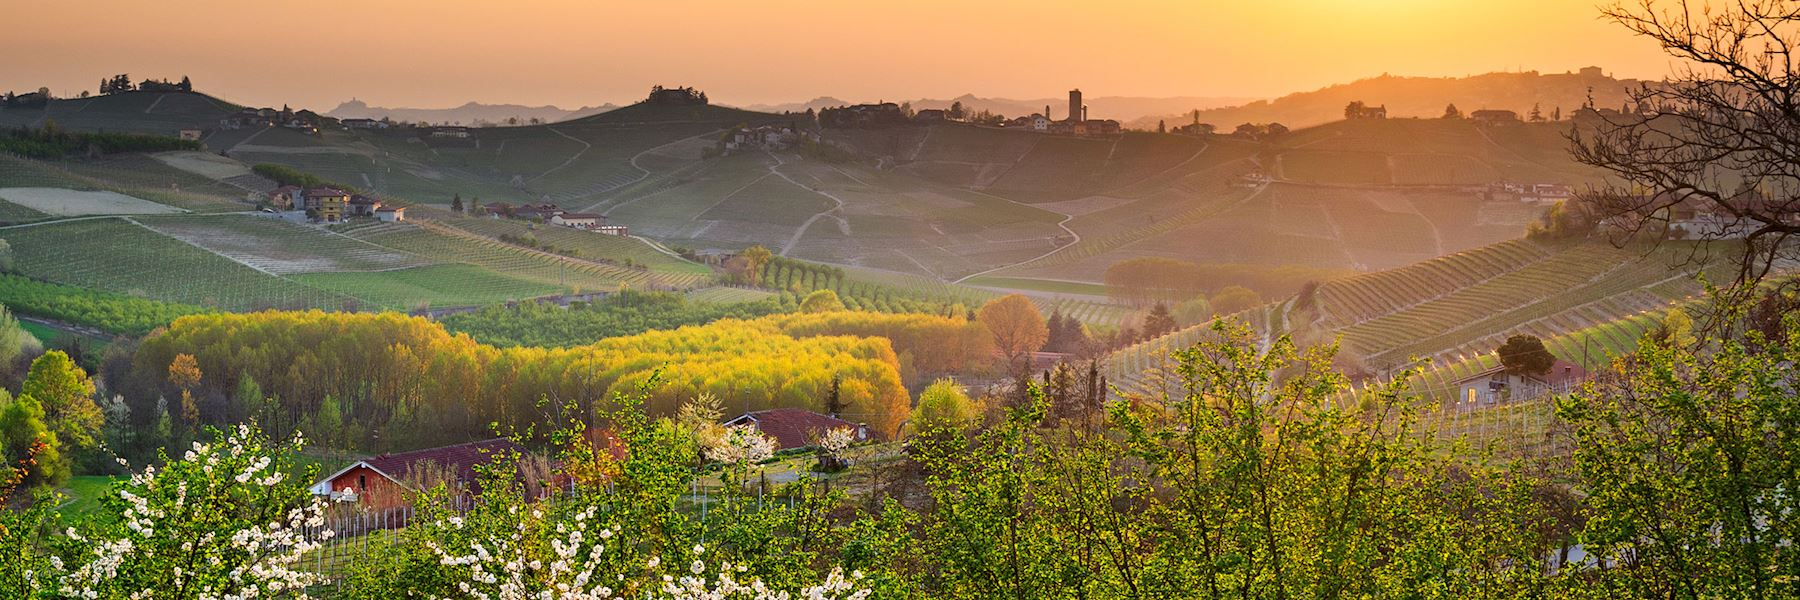 Visit Barbaresco, Italy